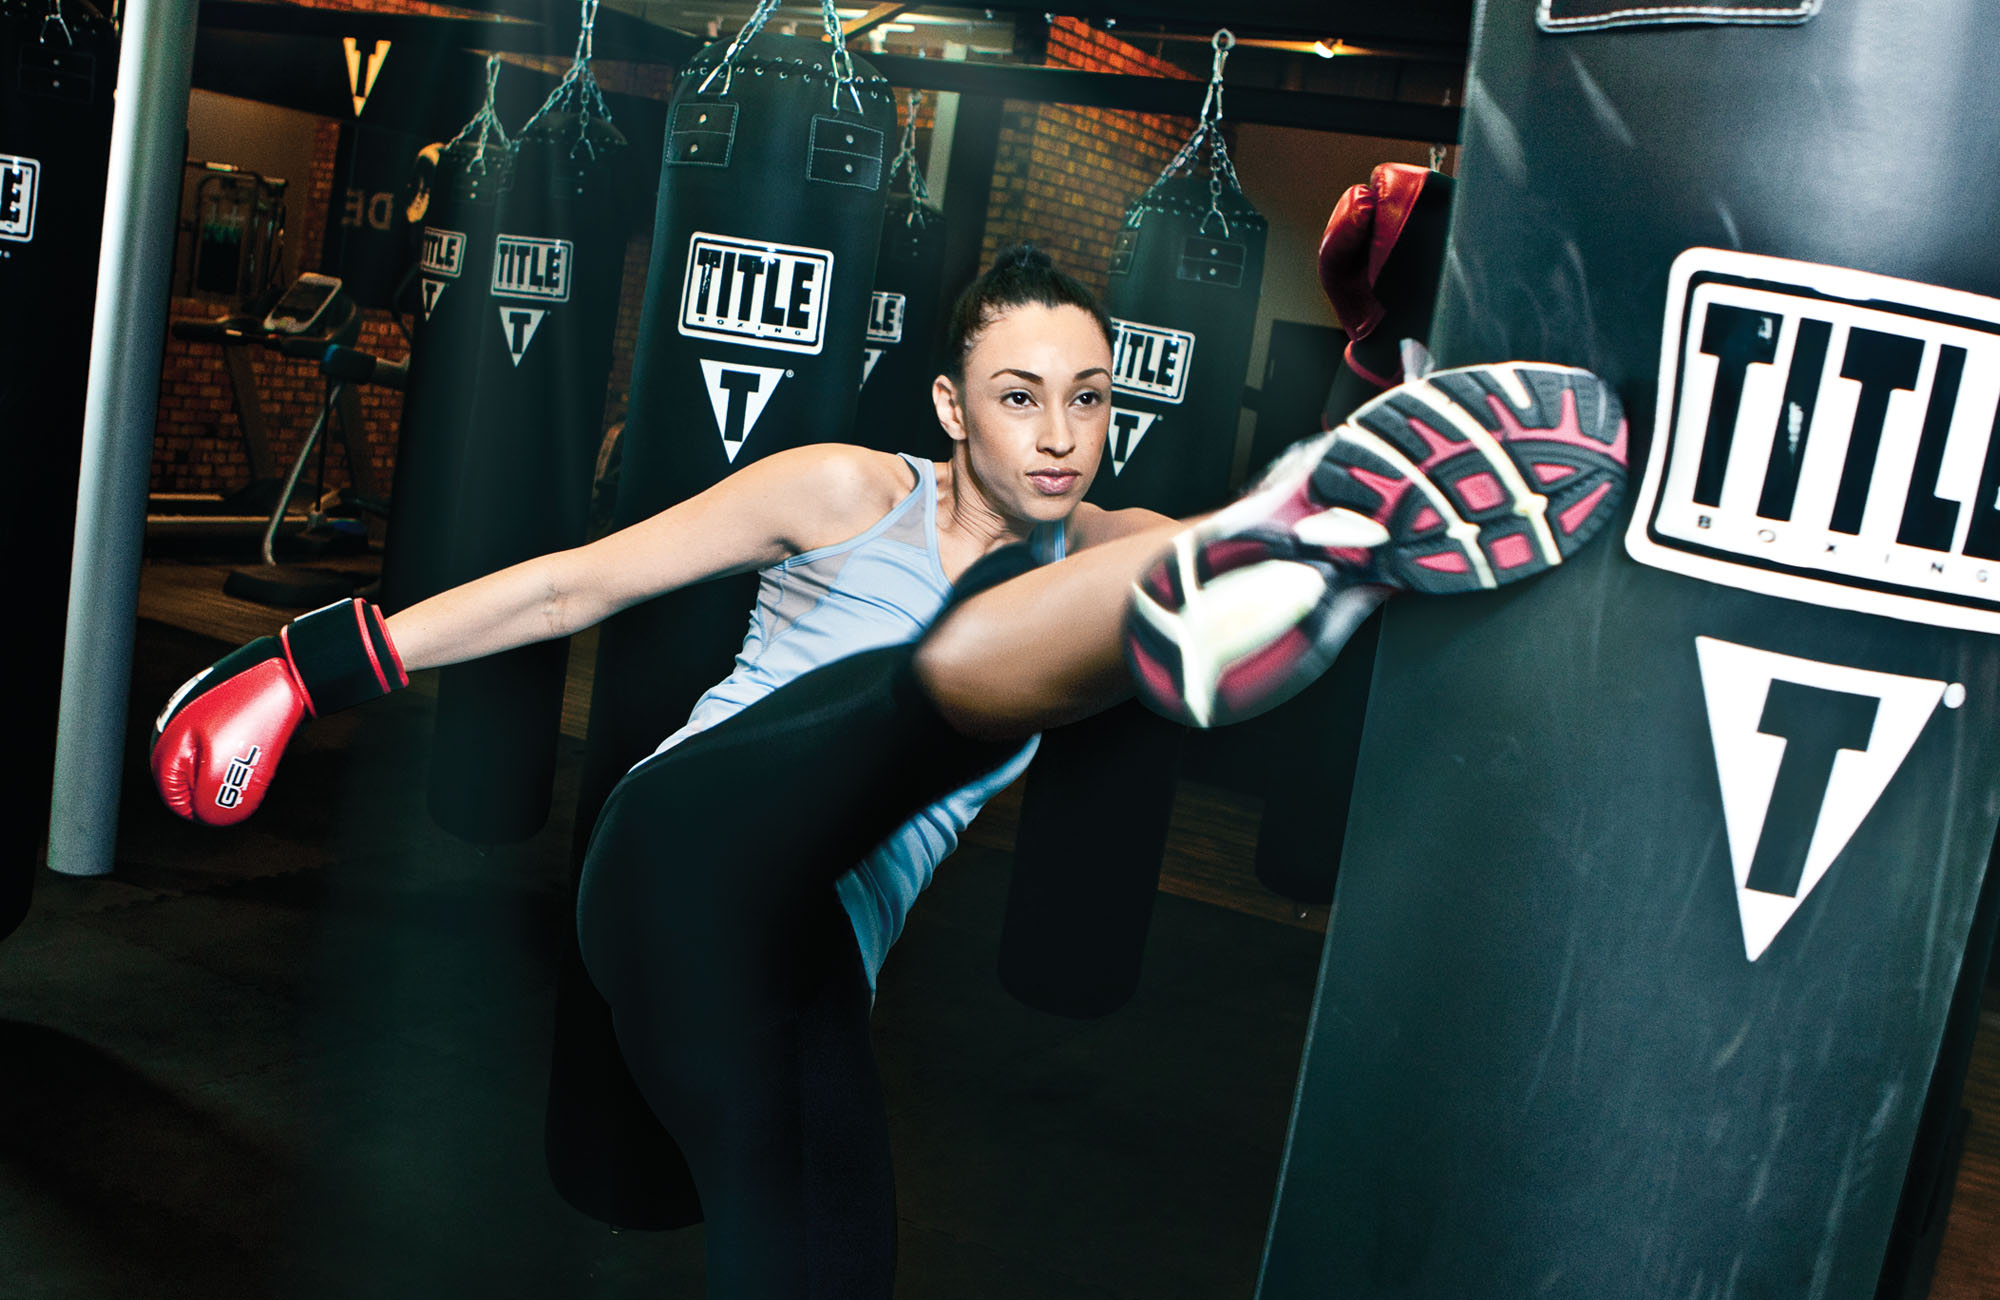 Boxing Franchise for Sale Announces Profitable Business Acquisition Services for Clients in Atlanta, Jacksonville & Dallas 1